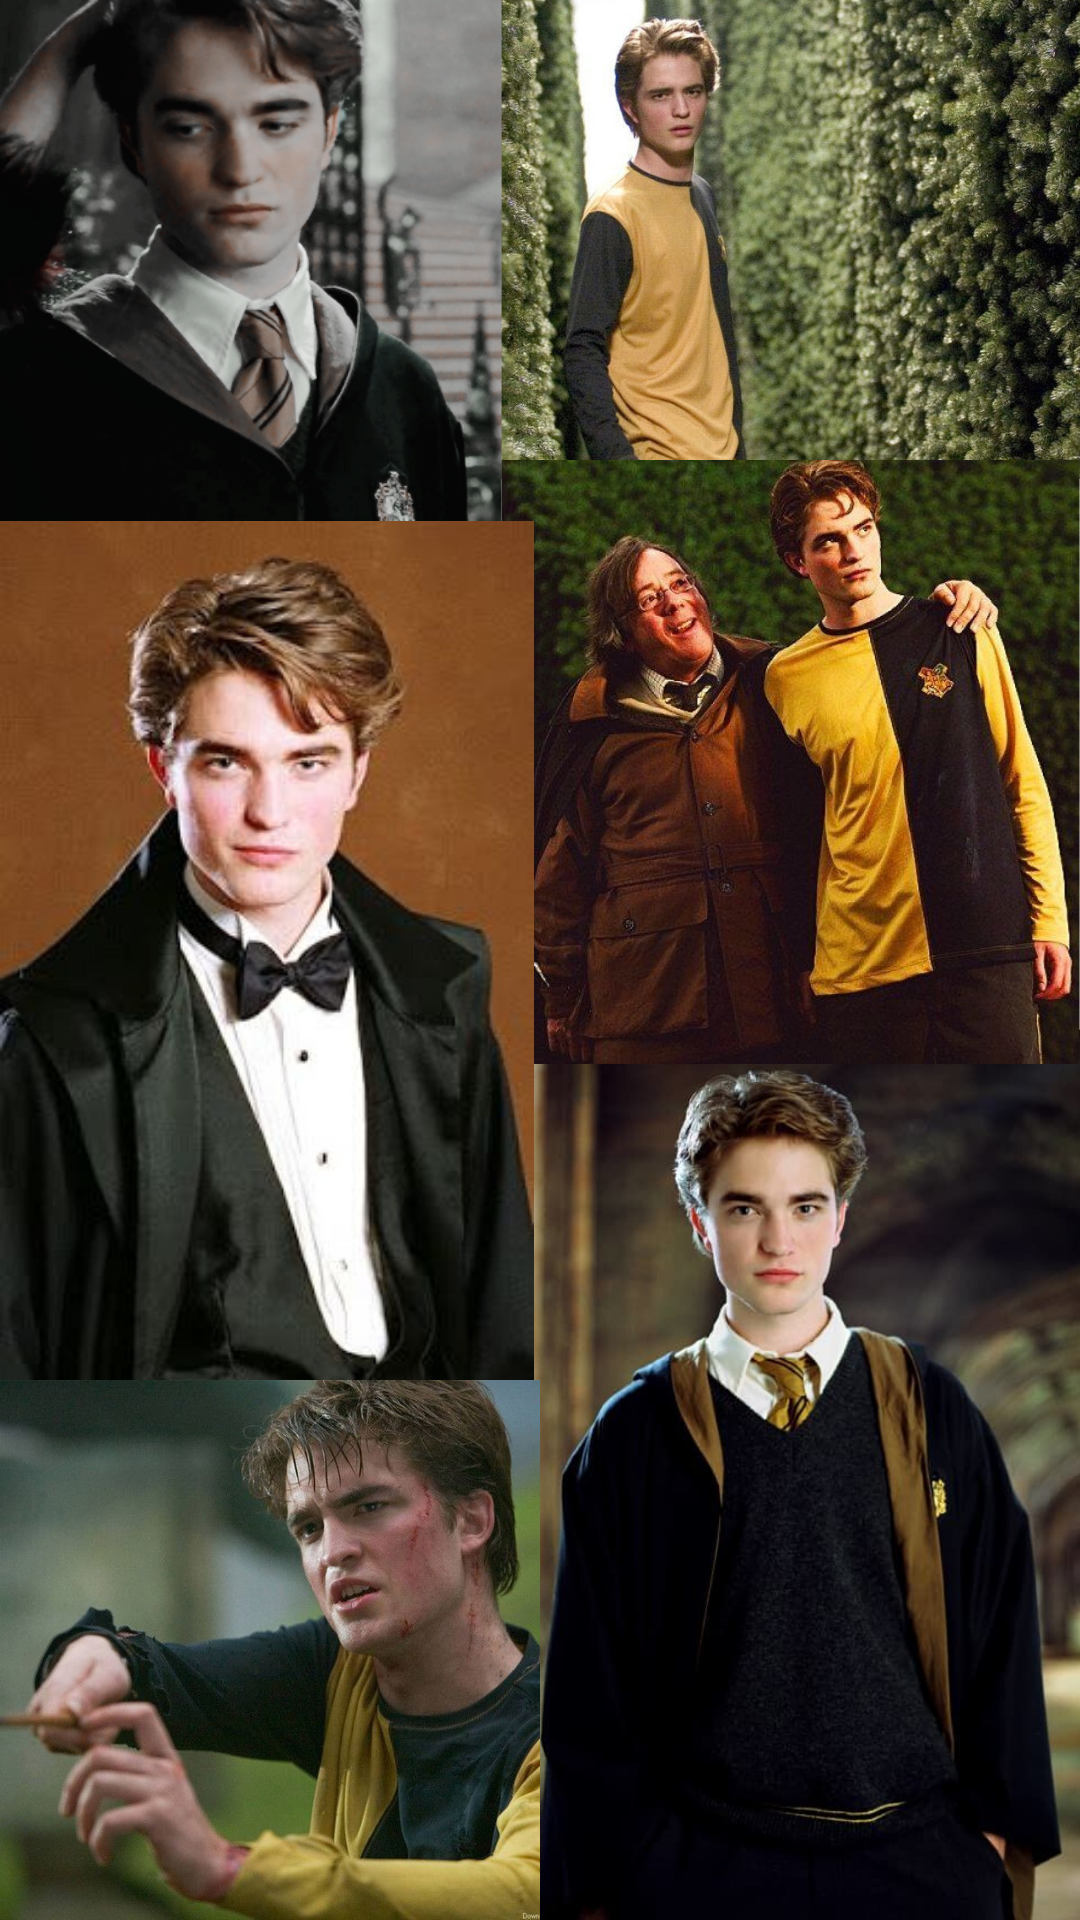 Cedric Diggory Cedric Diggory Harry Potter Hermione Cedric Diggory Aesthetic